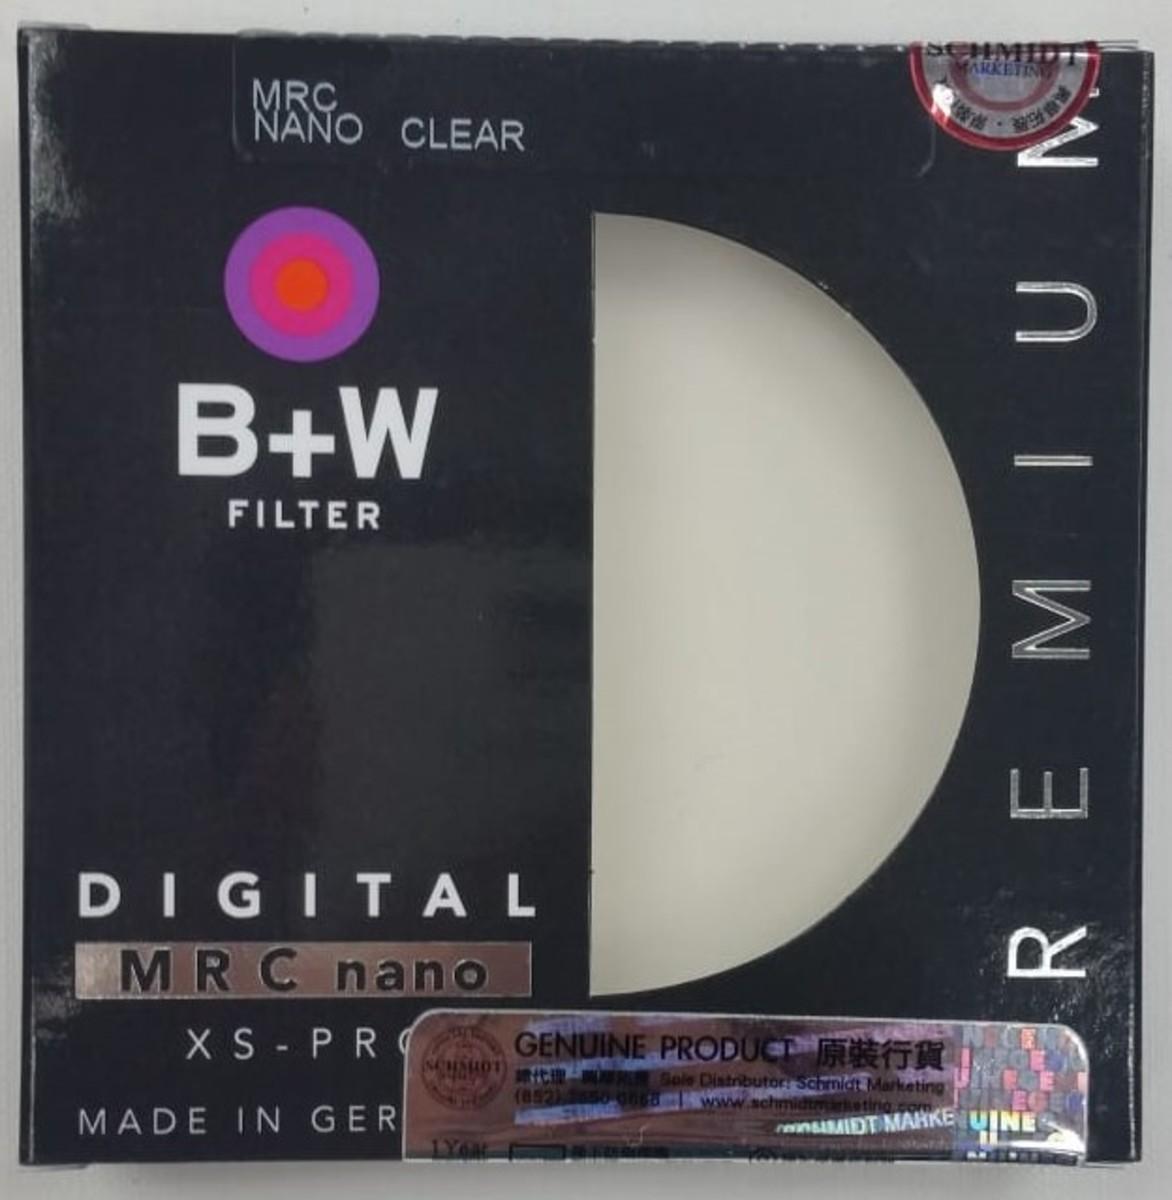 43mm XS-Pro Digital 007 Clear filter MRC nano Protector頂級保護鏡